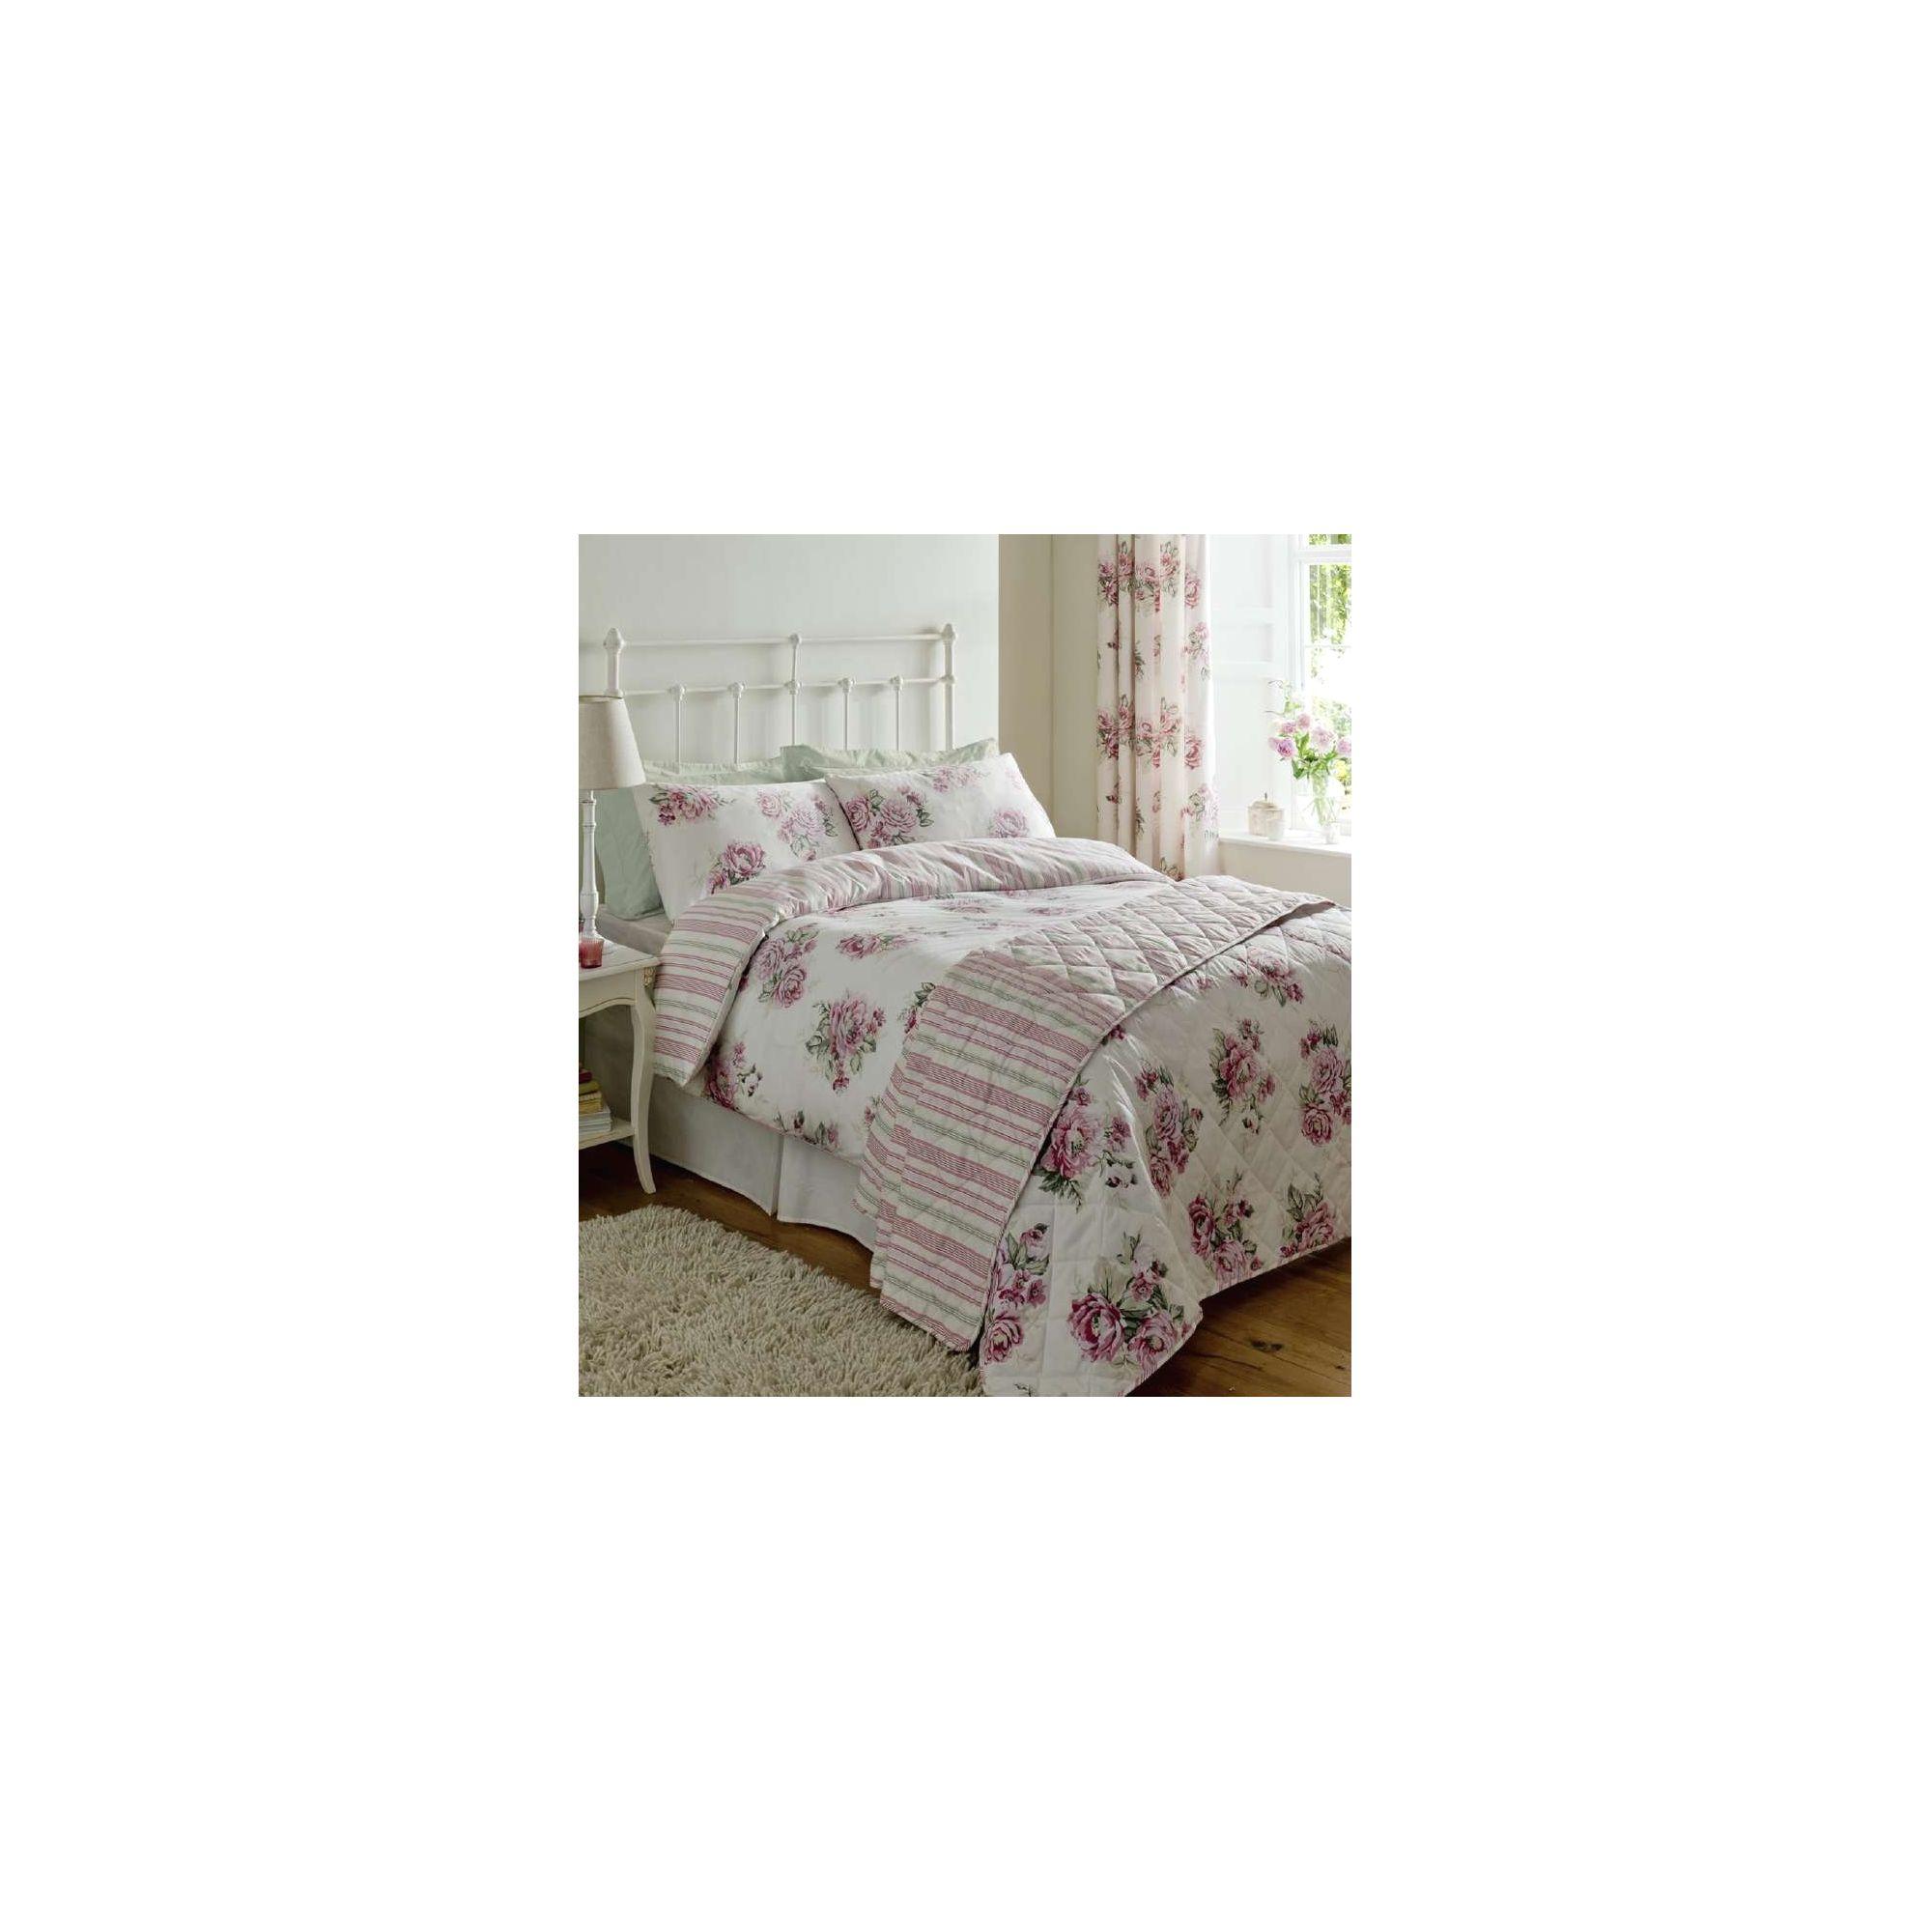 Lansfield Signature Canterbury Floral Duvet Cover Set